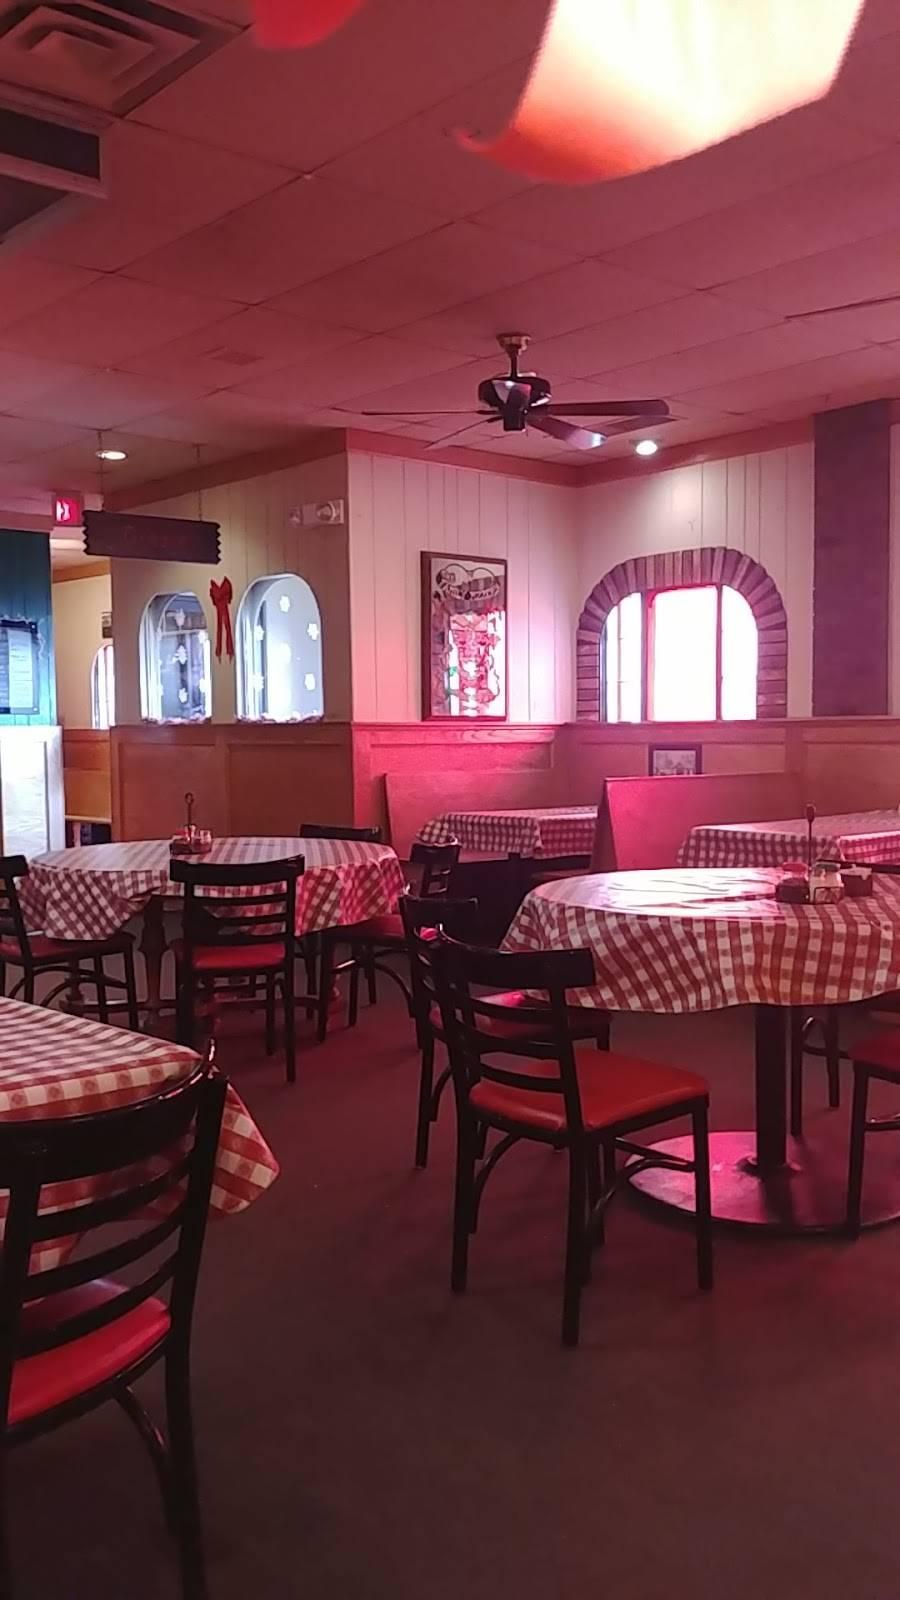 Aurelios Pizza | restaurant | 601 E 170th St, South Holland, IL 60473, USA | 7083330310 OR +1 708-333-0310